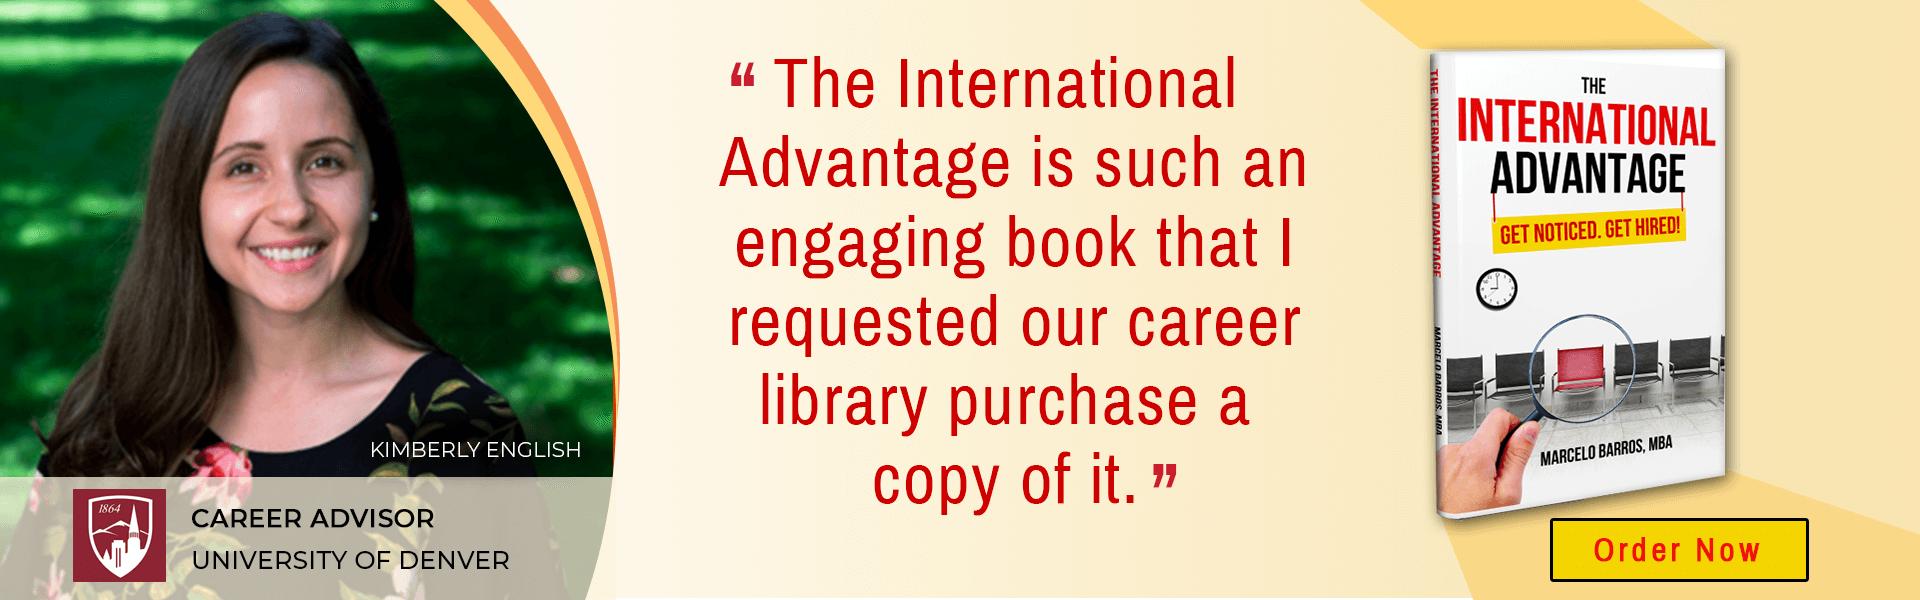 The International Advantage.png